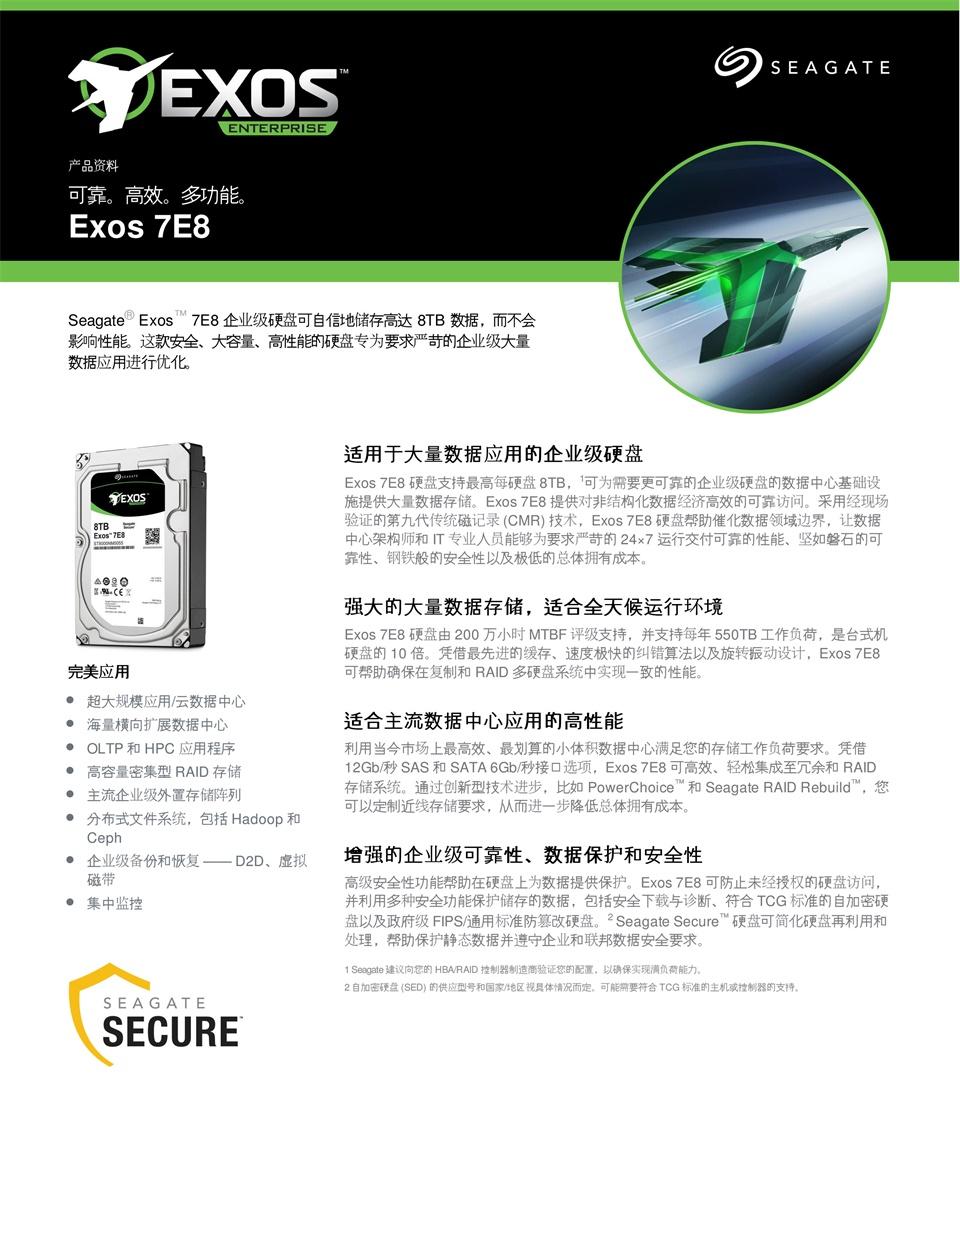 希捷 ST4000NM0025 系列 4TB 7200转 128M 512n SAS 企业级硬盘